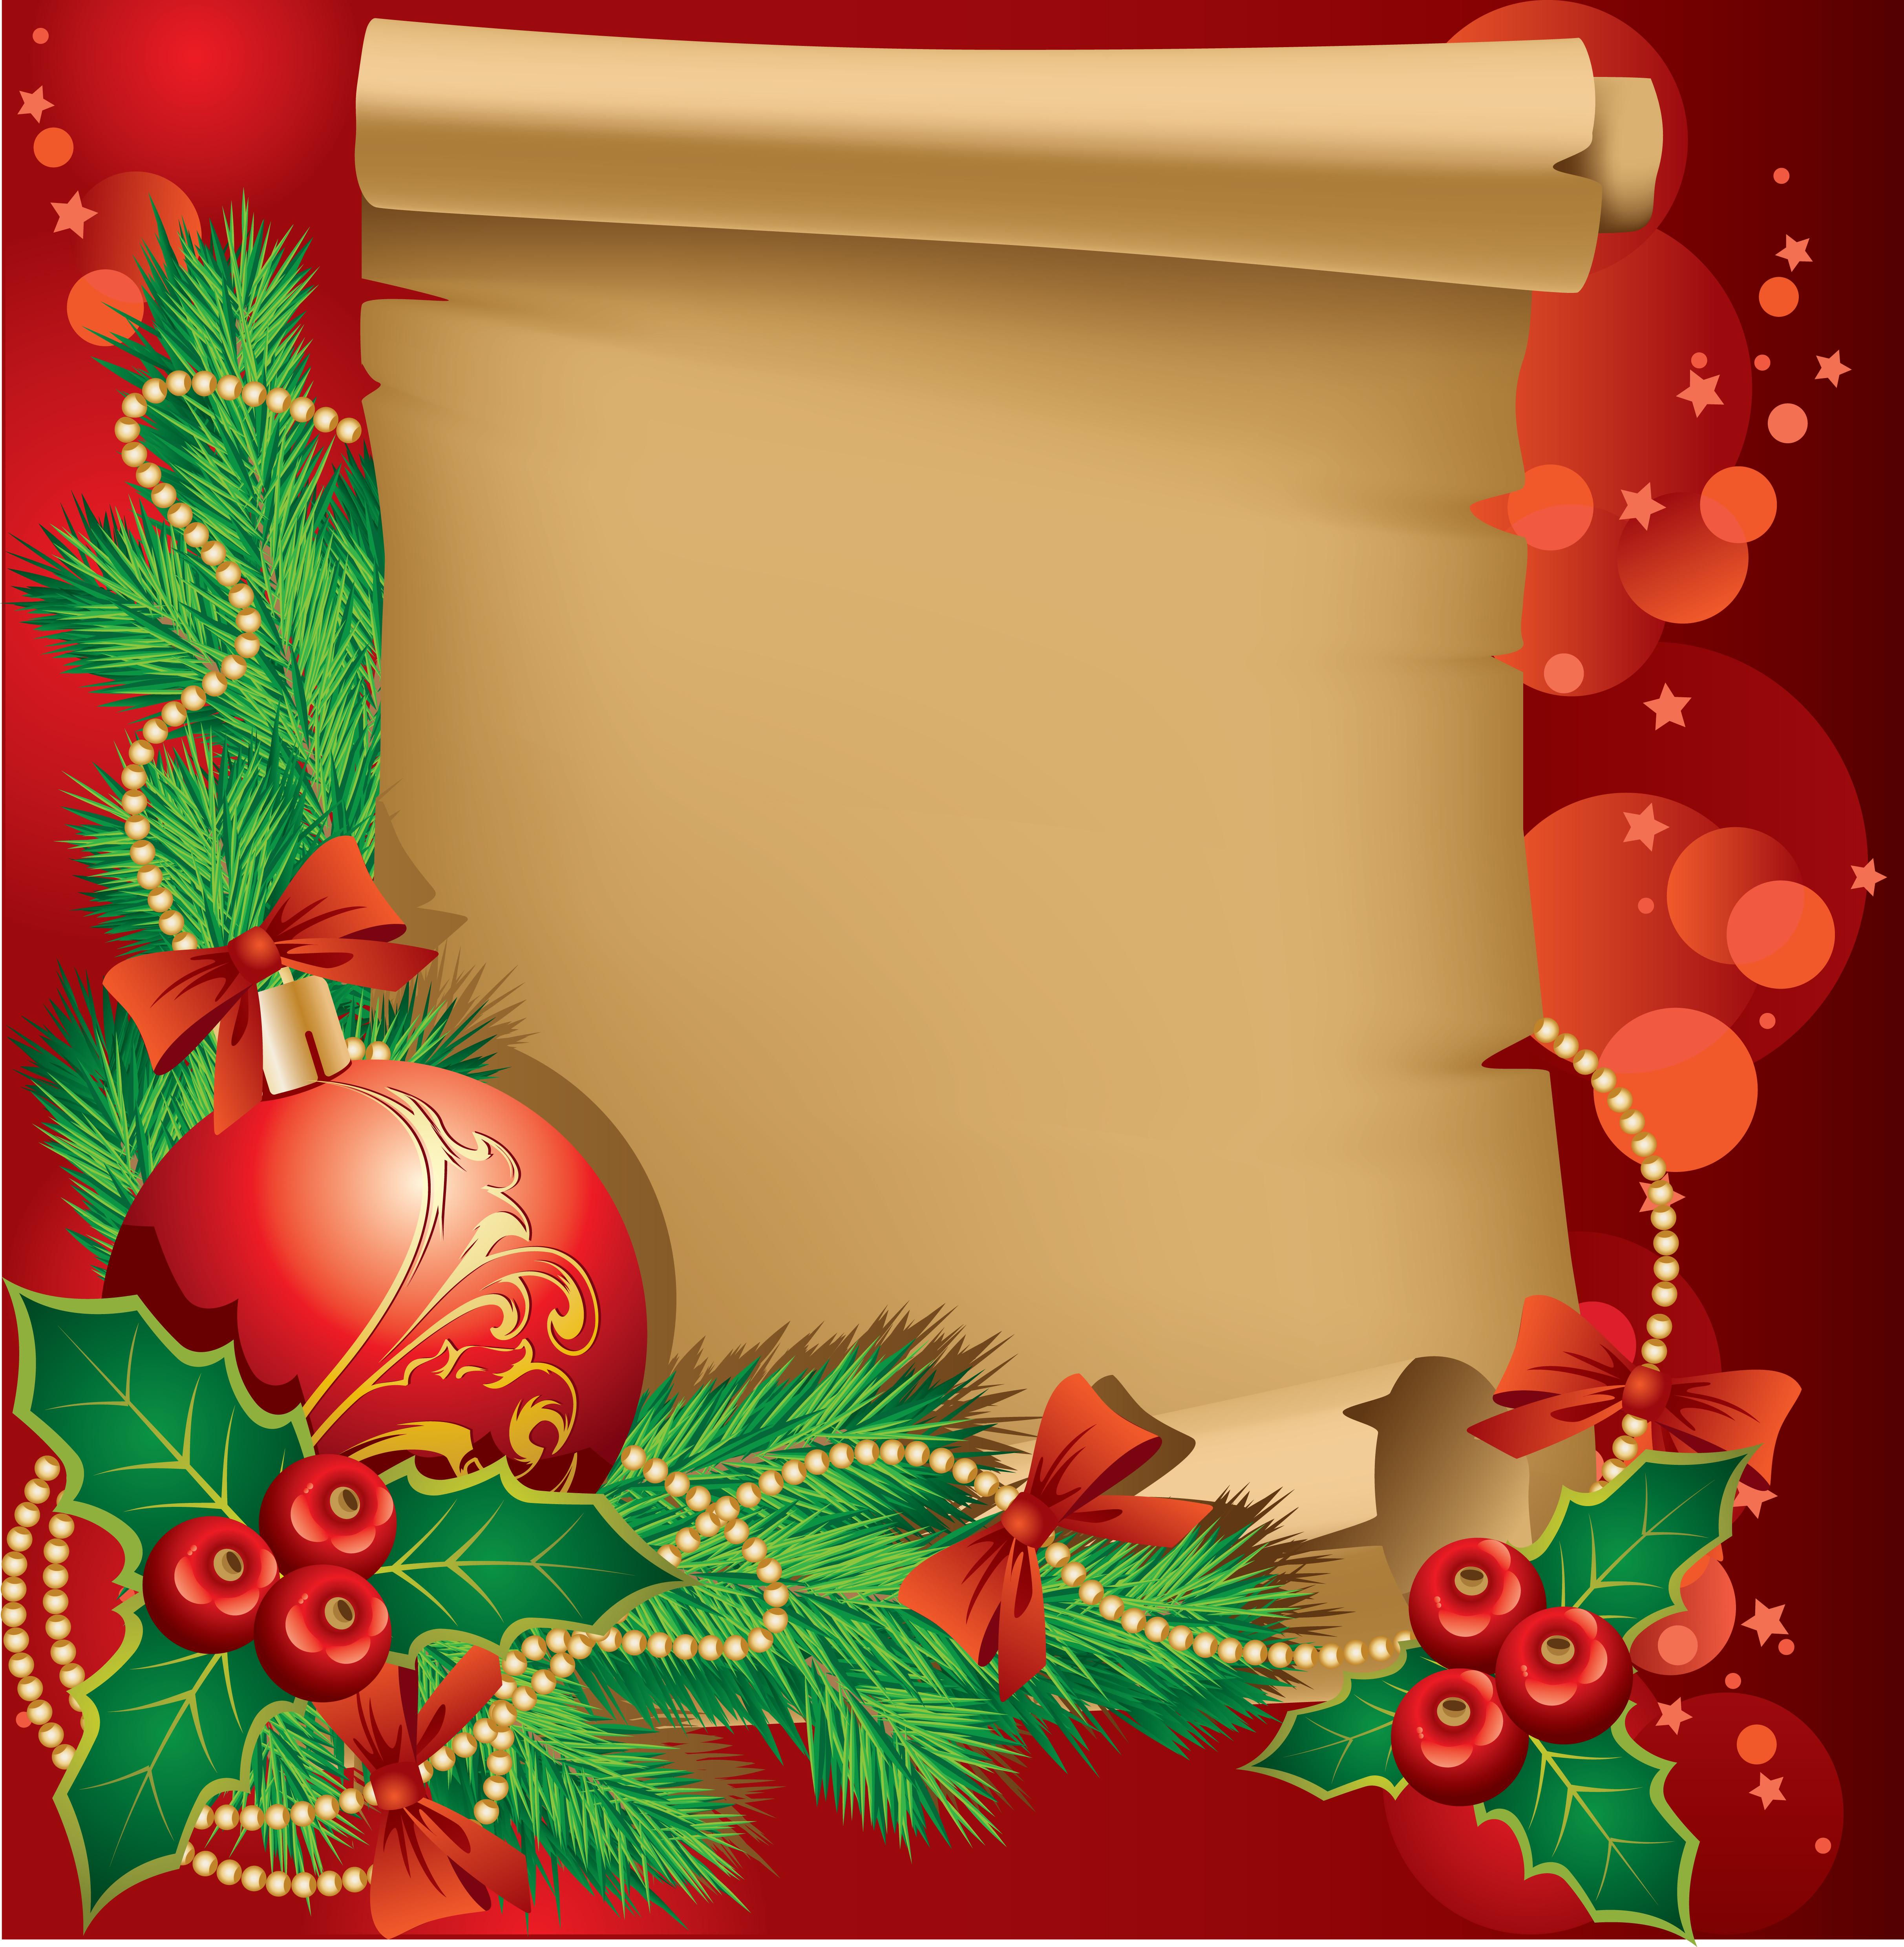 Horizontal Christmas Tree Border Clipart.